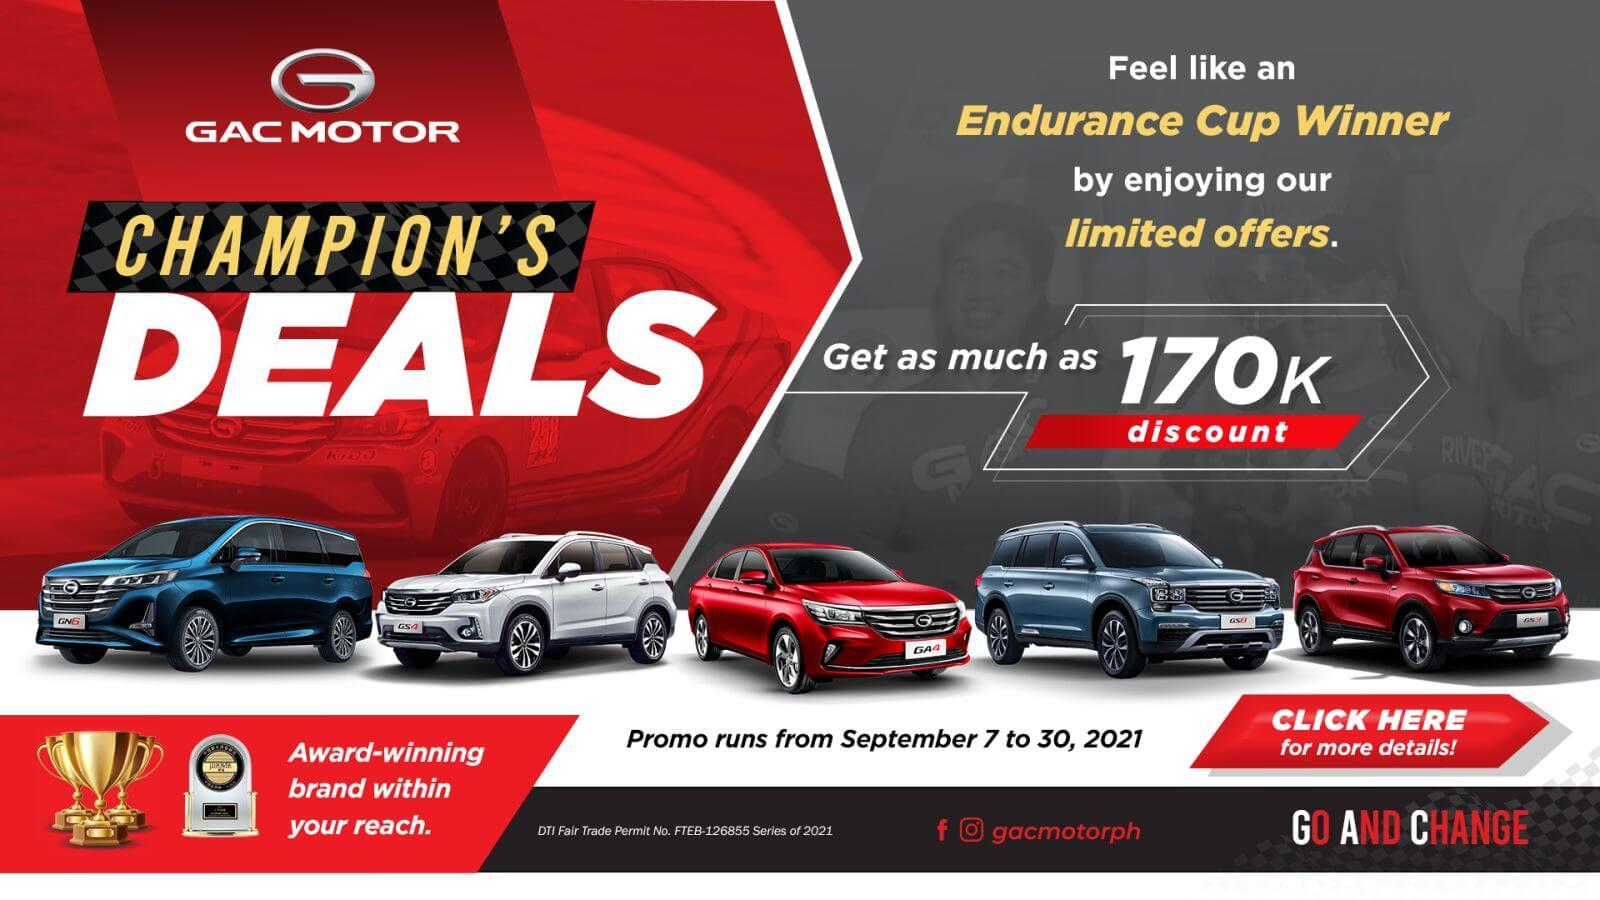 GAC Motor Champion's Deals